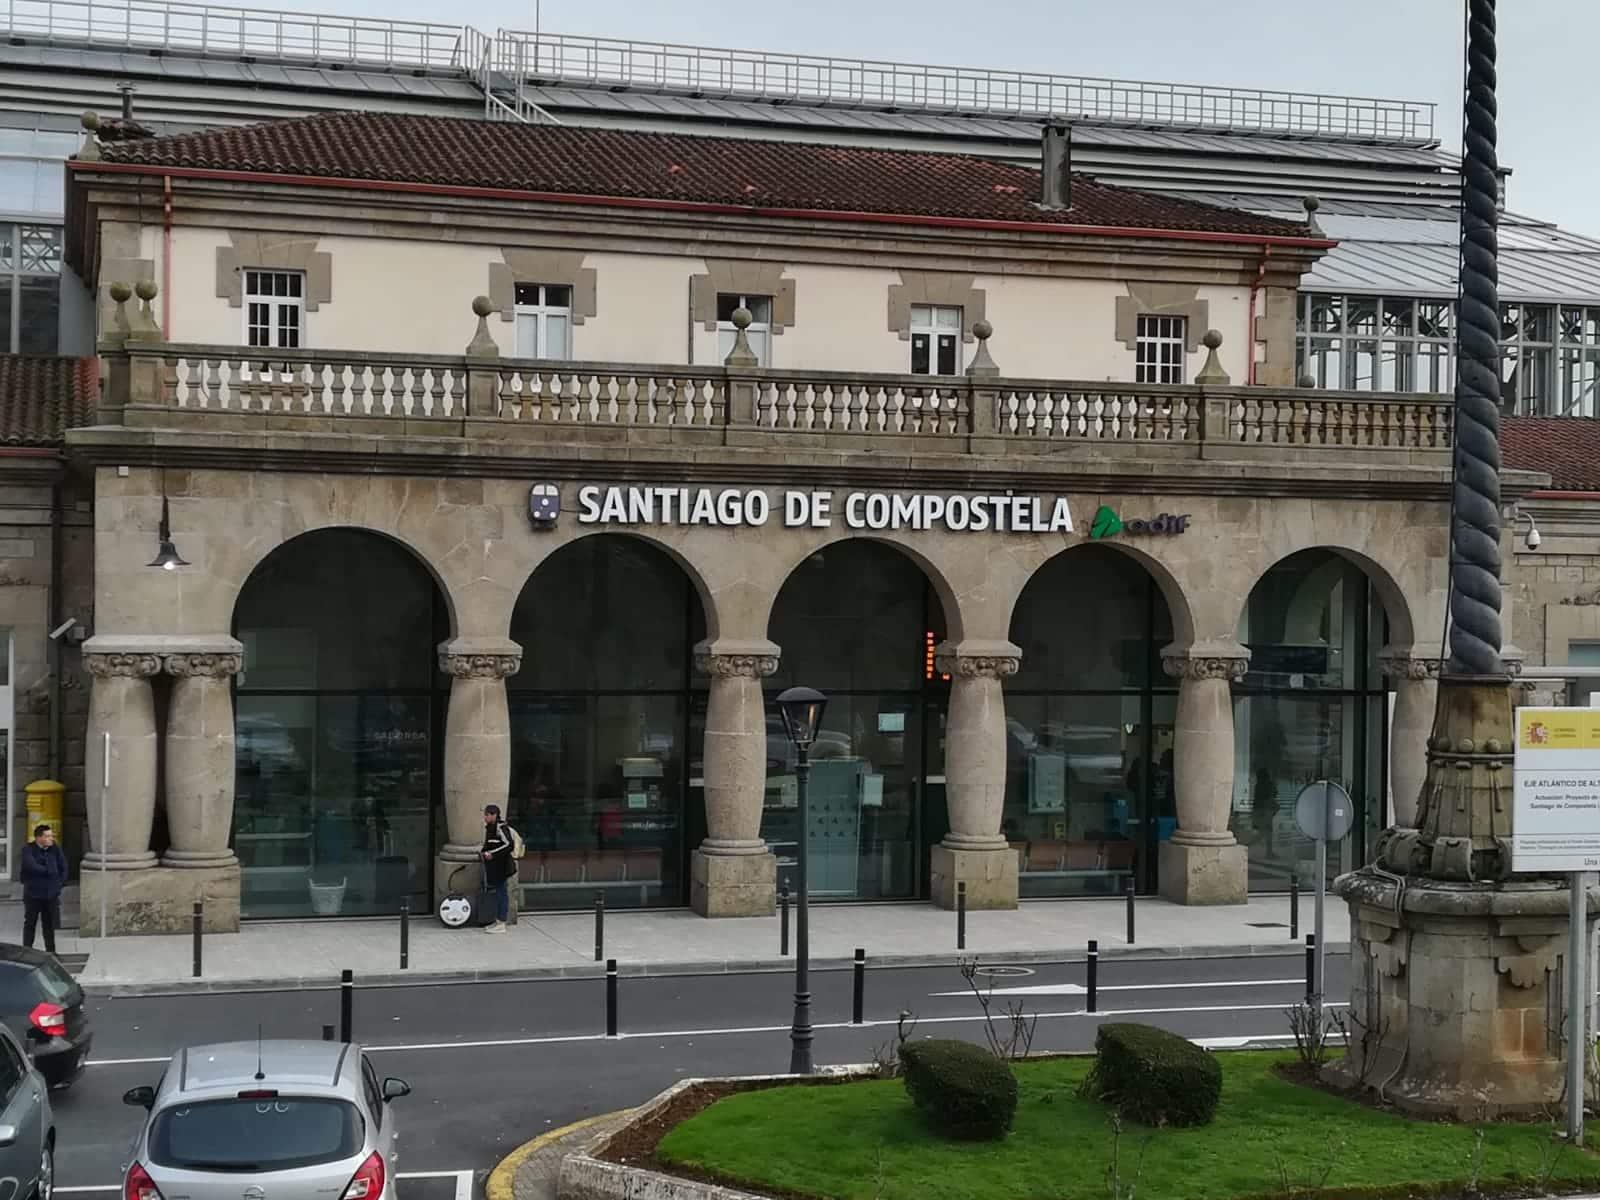 Estación de ferrocarril de SCQ